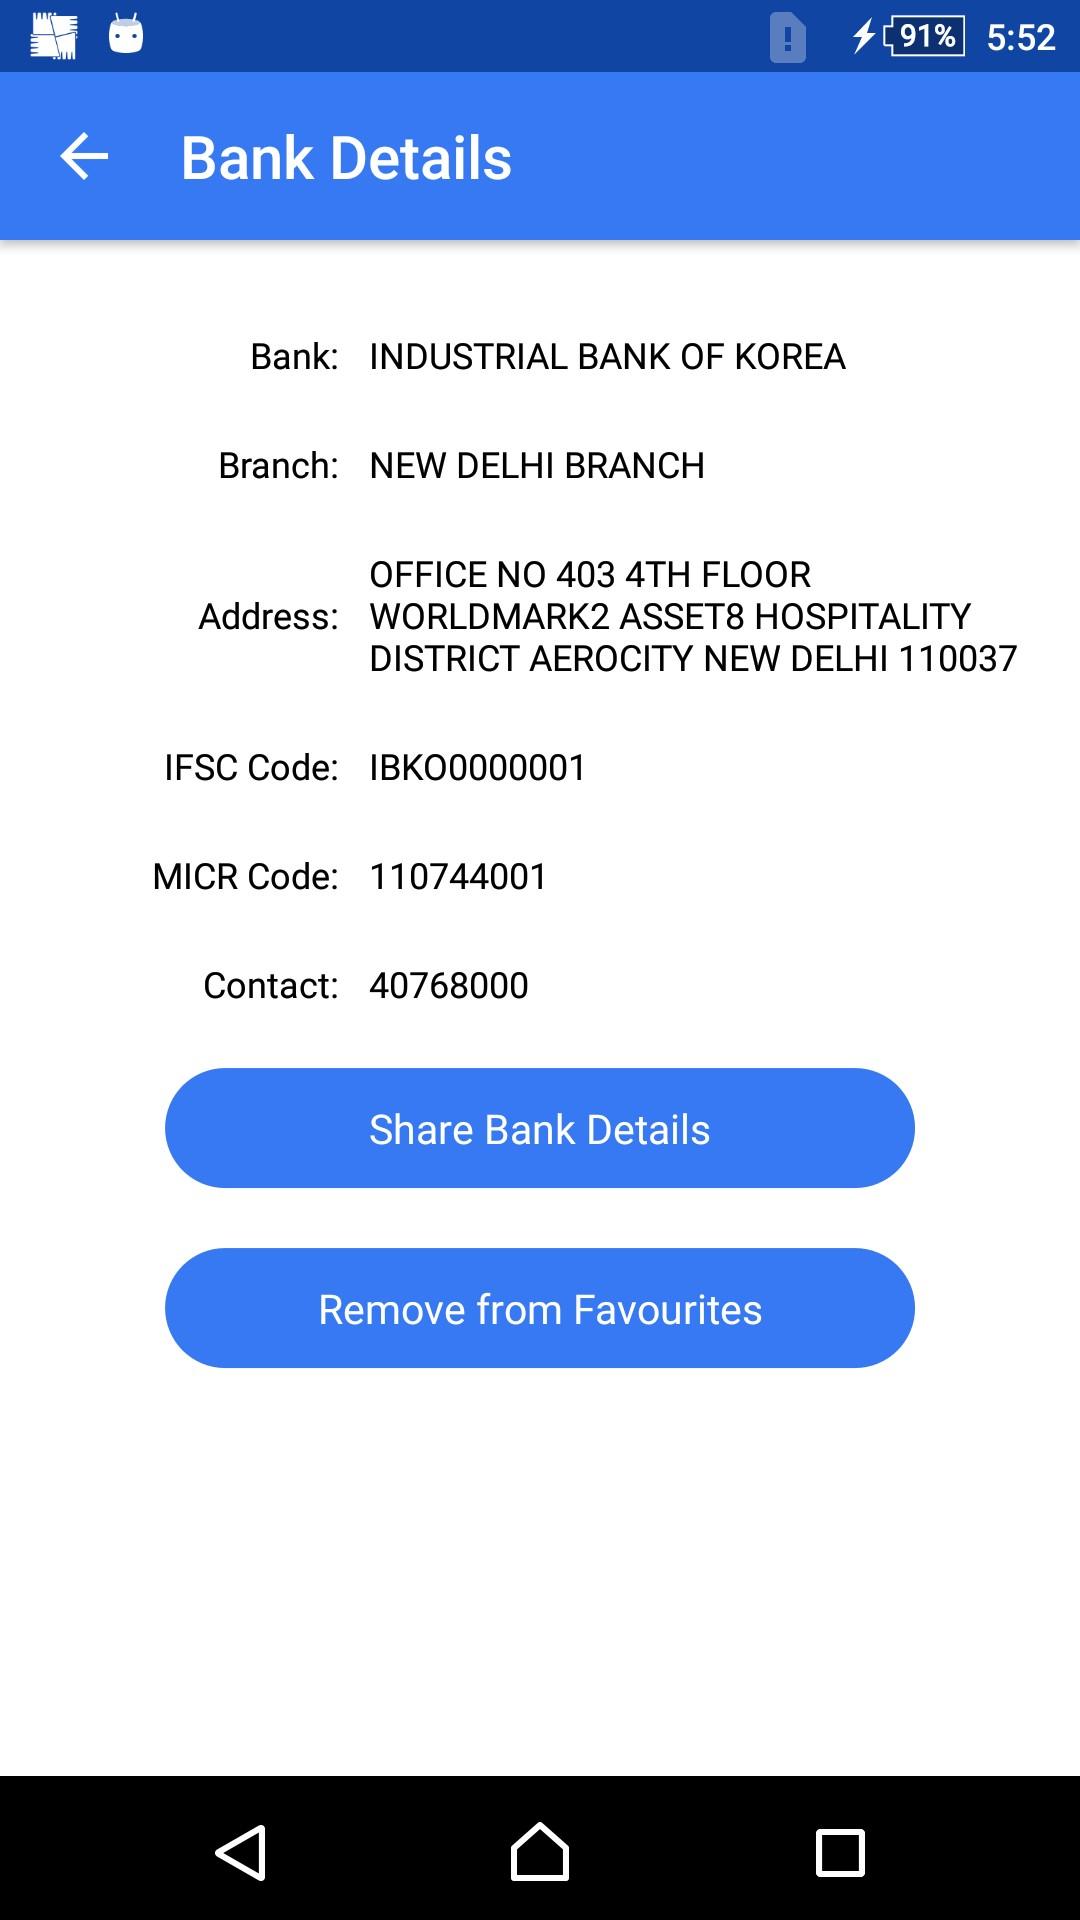 Indian Banks Info (IFSC, MICR)